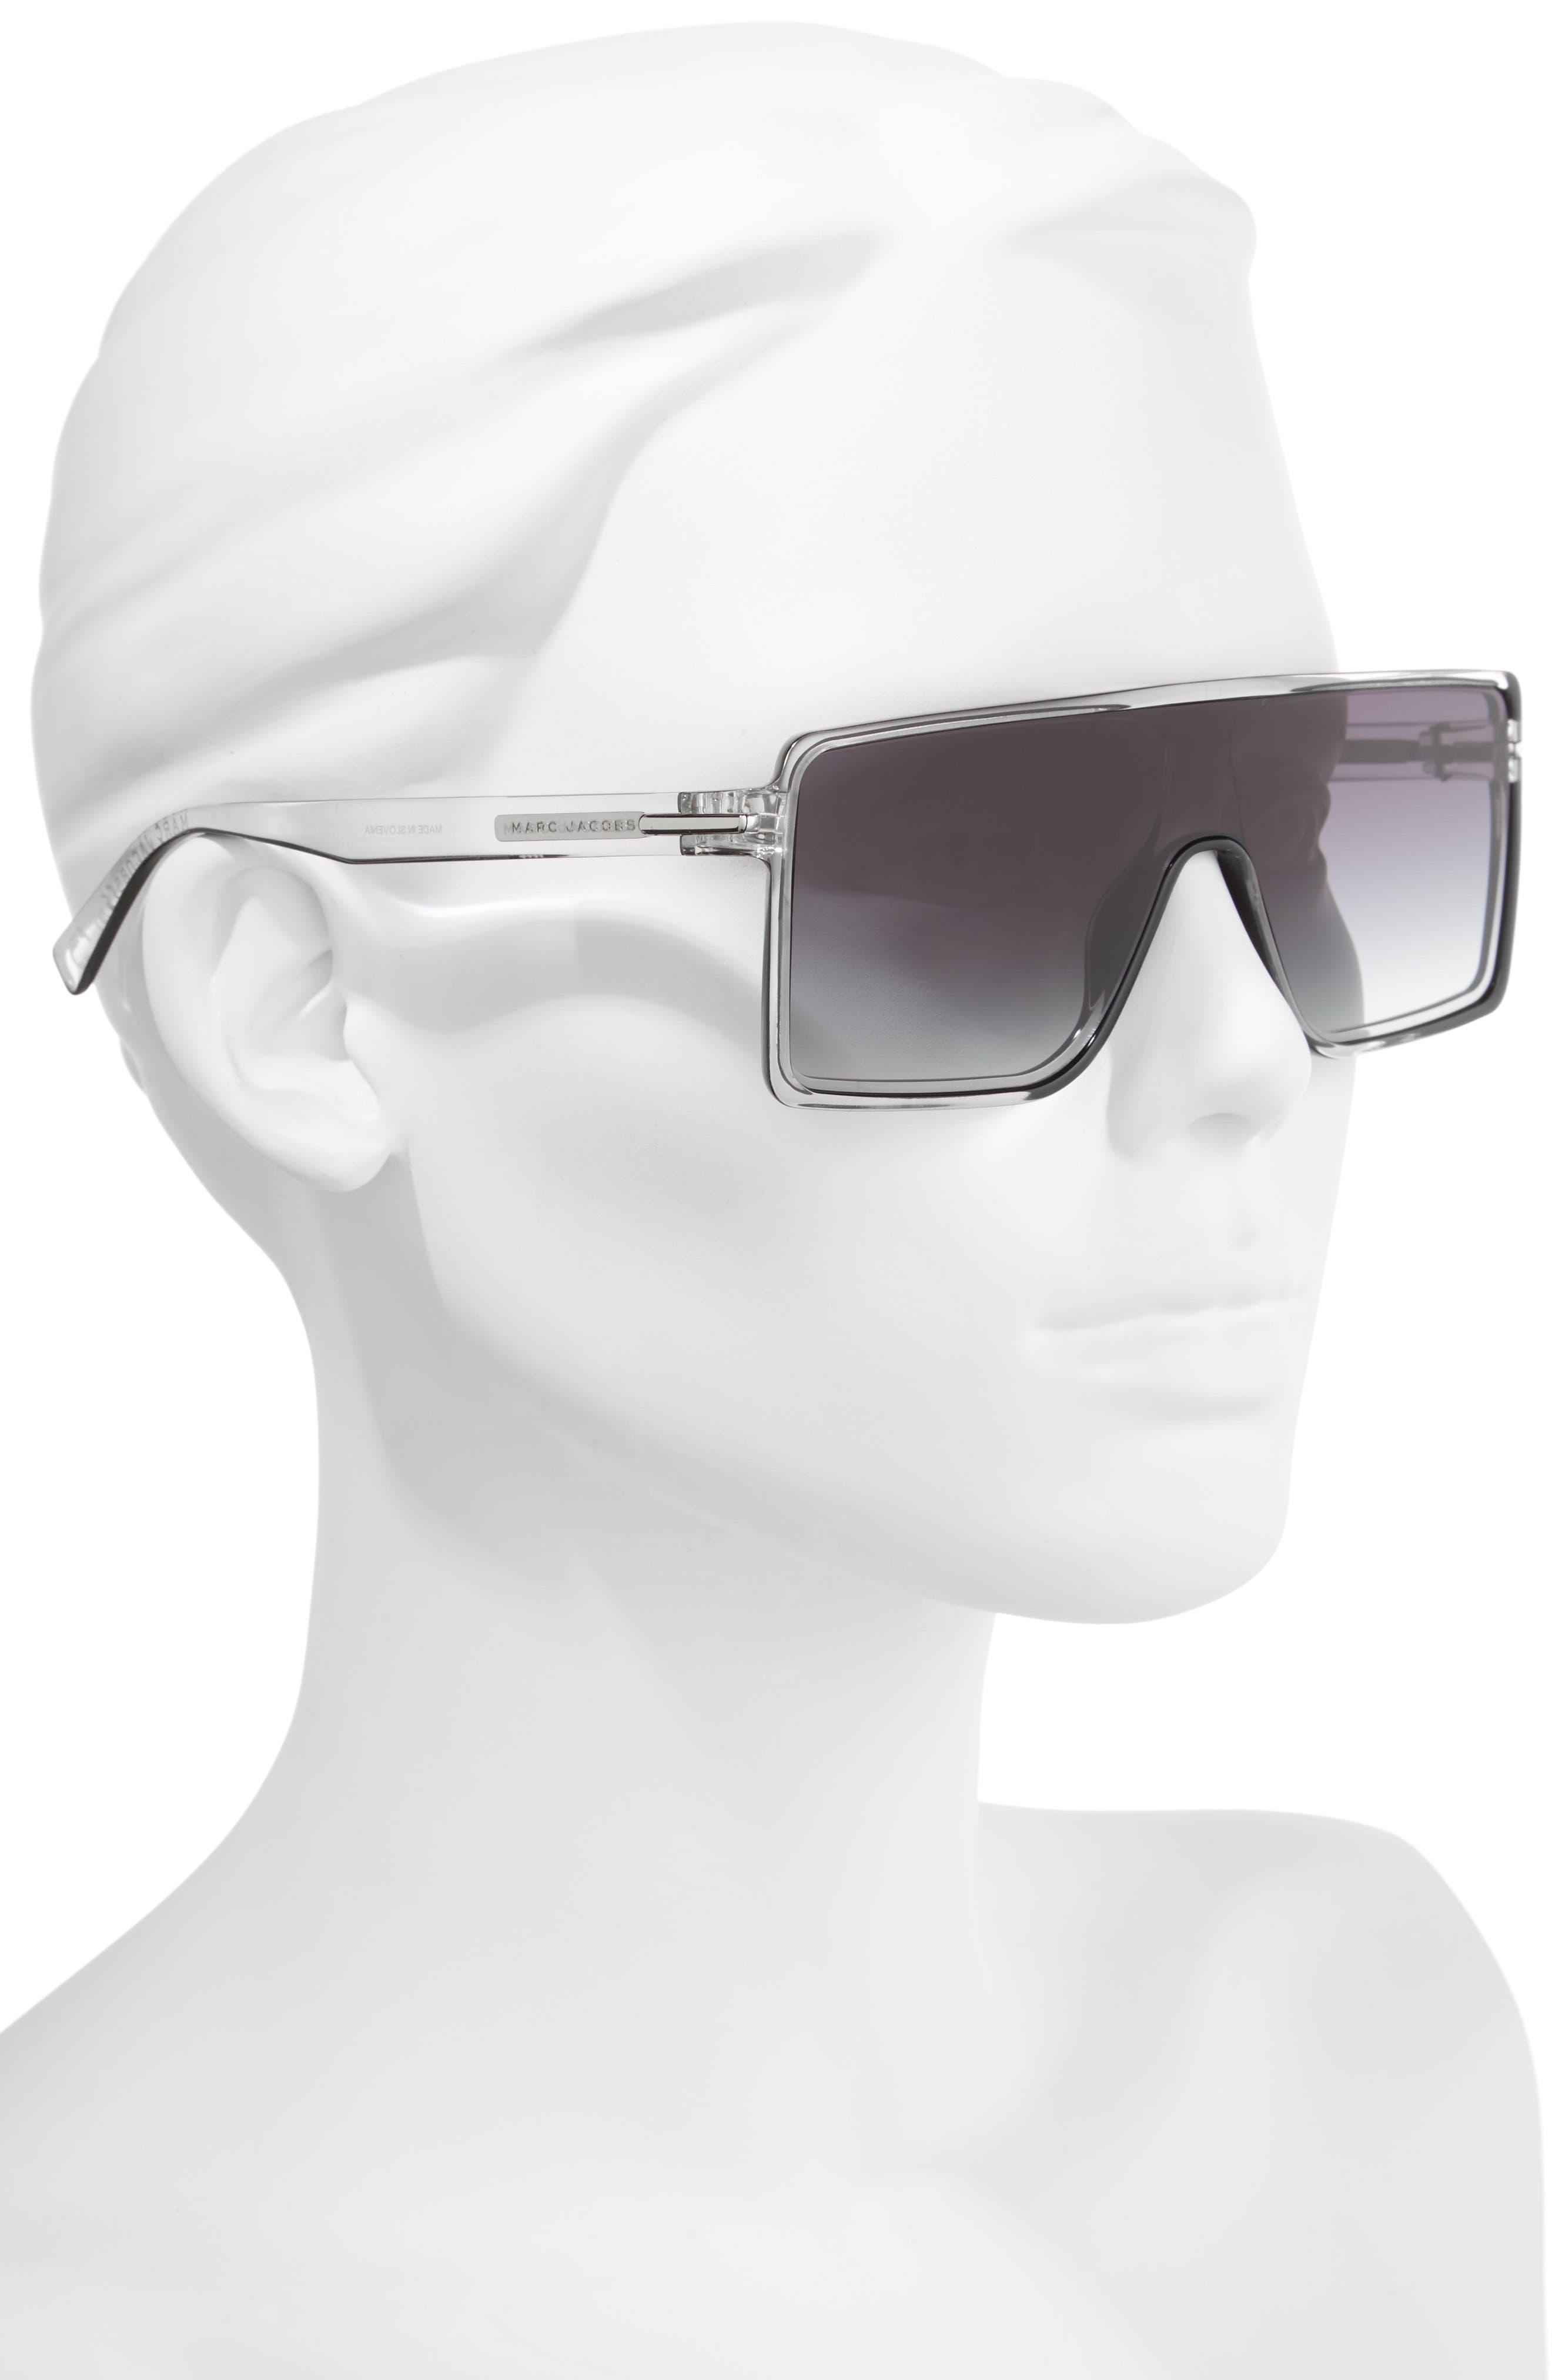 54mm Shield Sunglasses,                             Alternate thumbnail 2, color,                             001